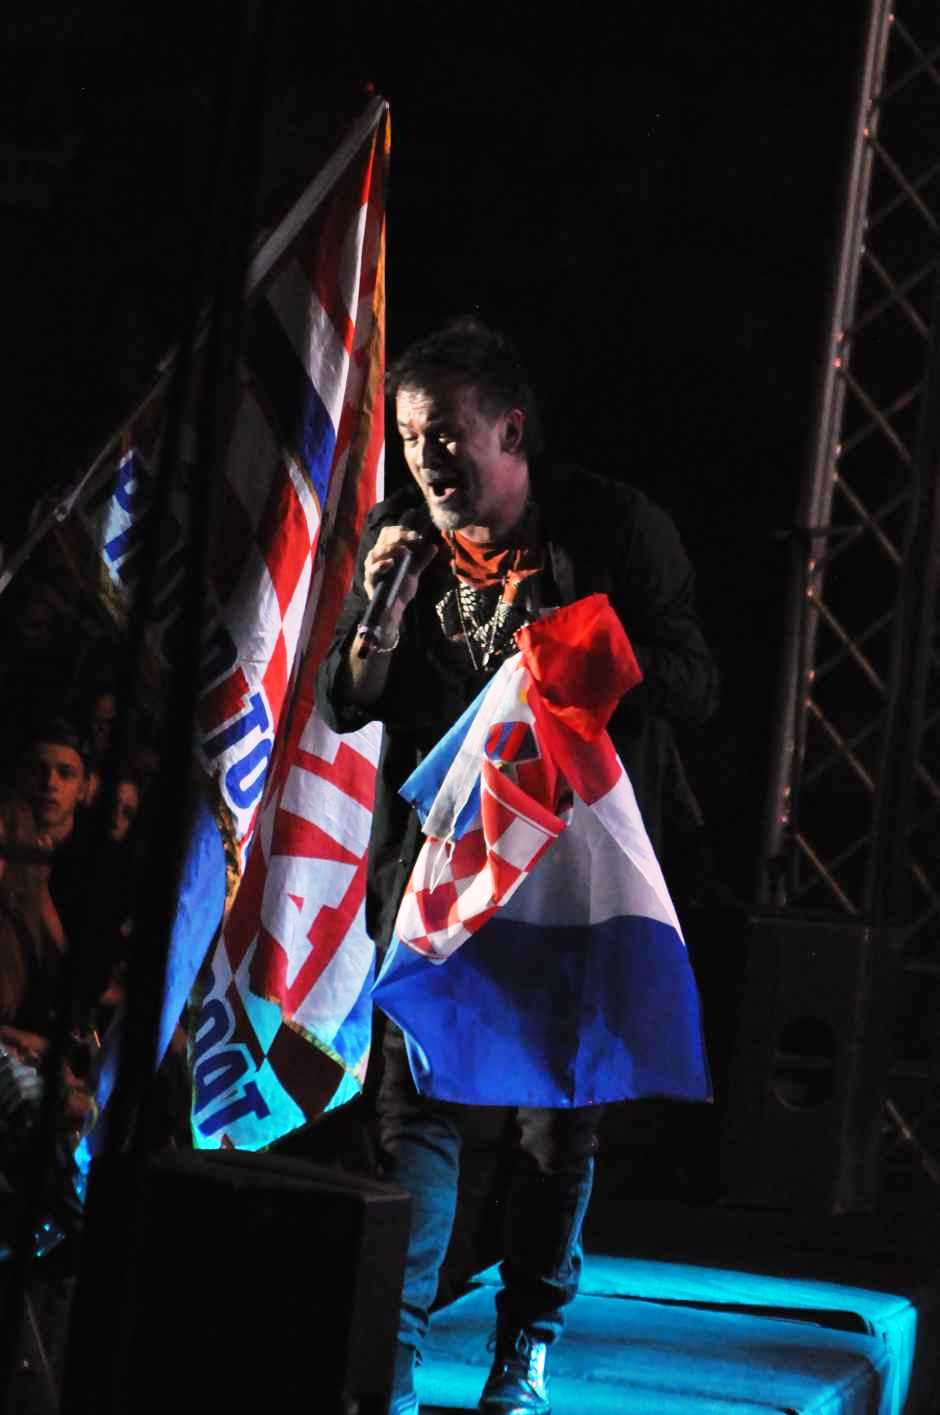 hrvatska-noc-2016-71